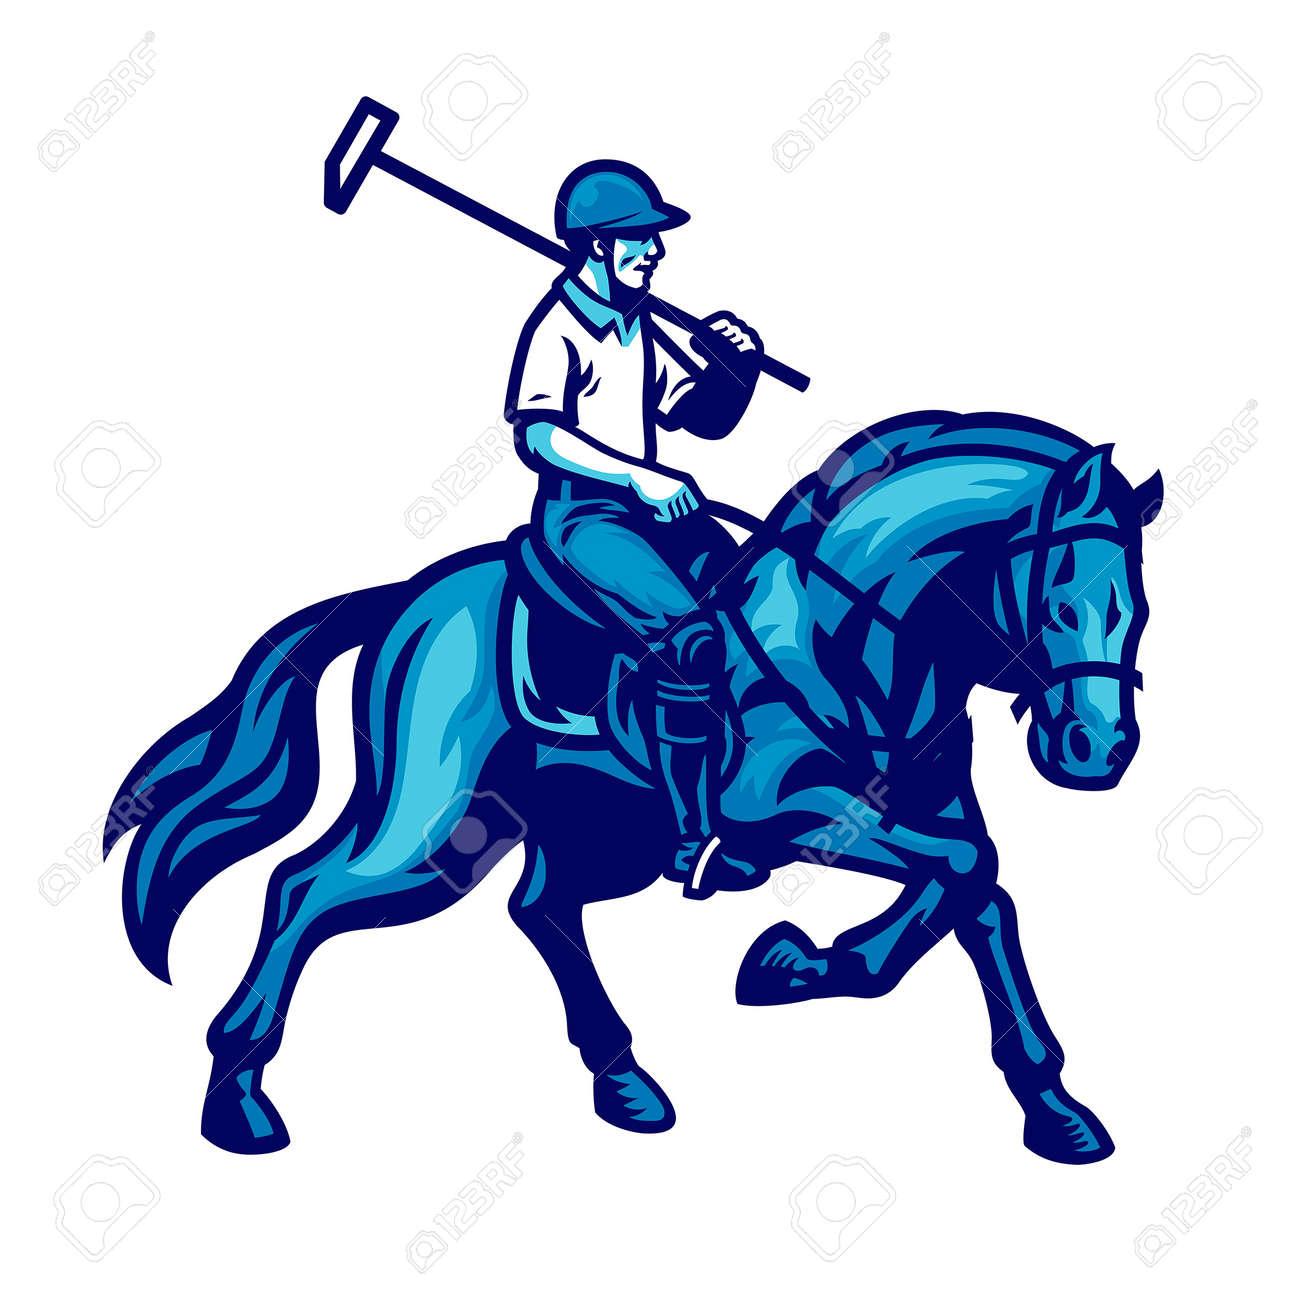 vector of polo player riding the horse - 165301245